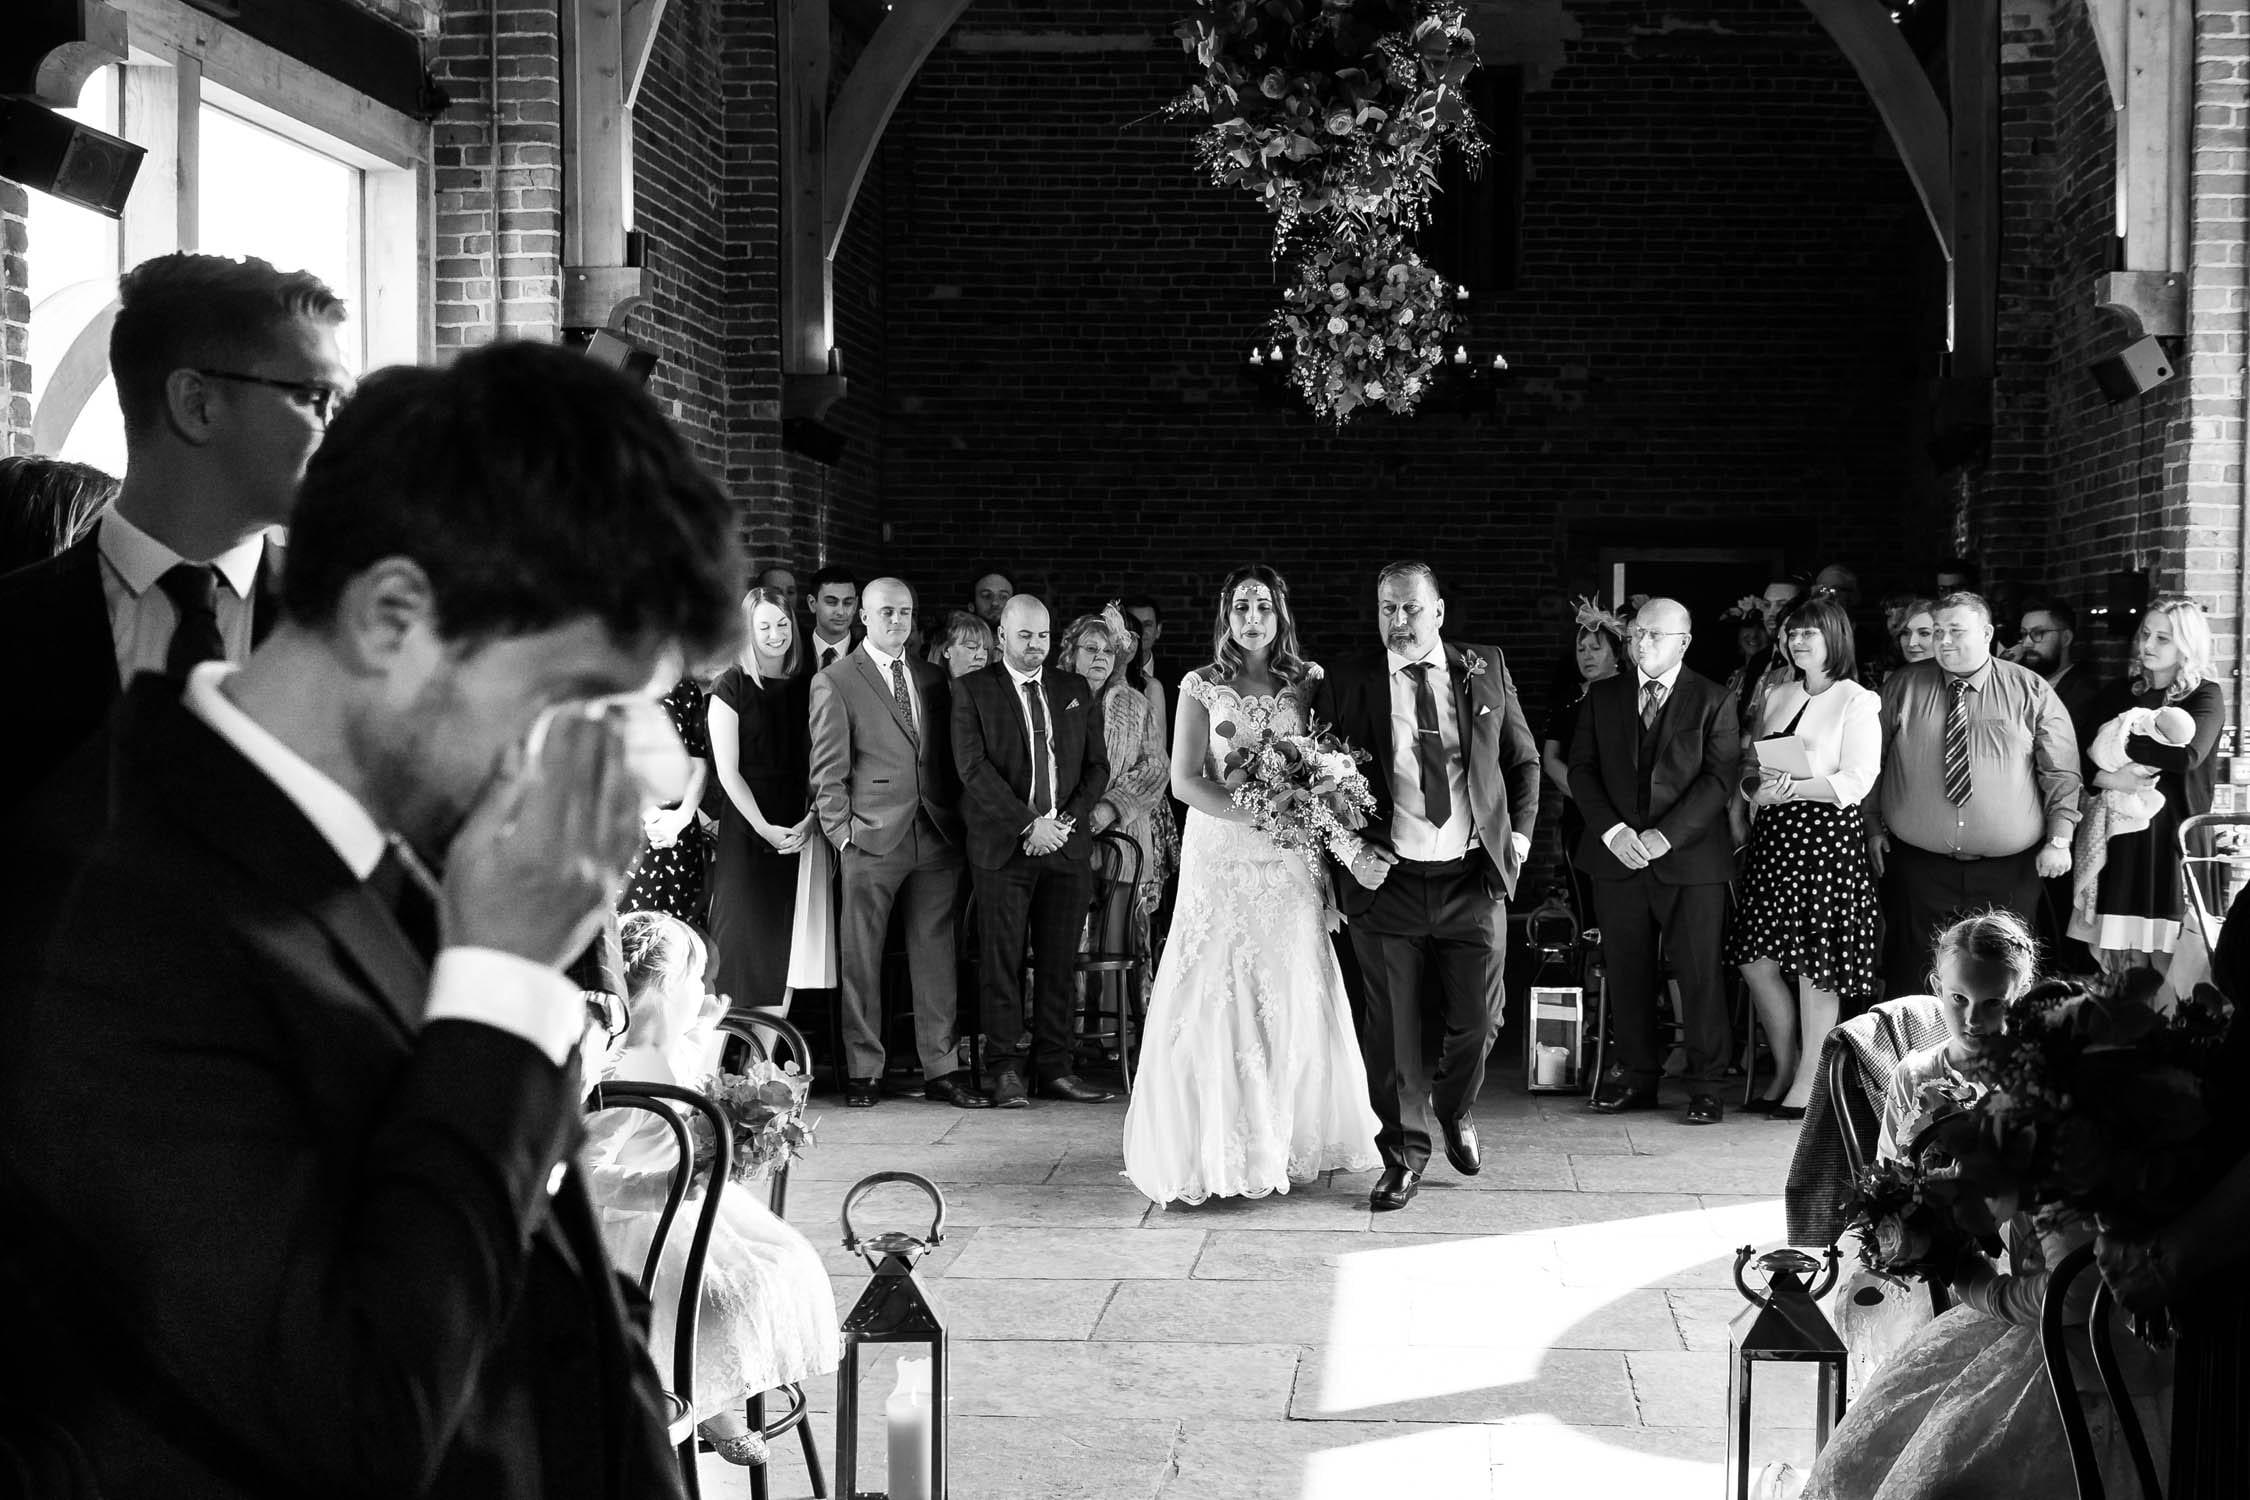 Bride walking down the aisle at Hazel Gap Barn as groom wipes away a tear